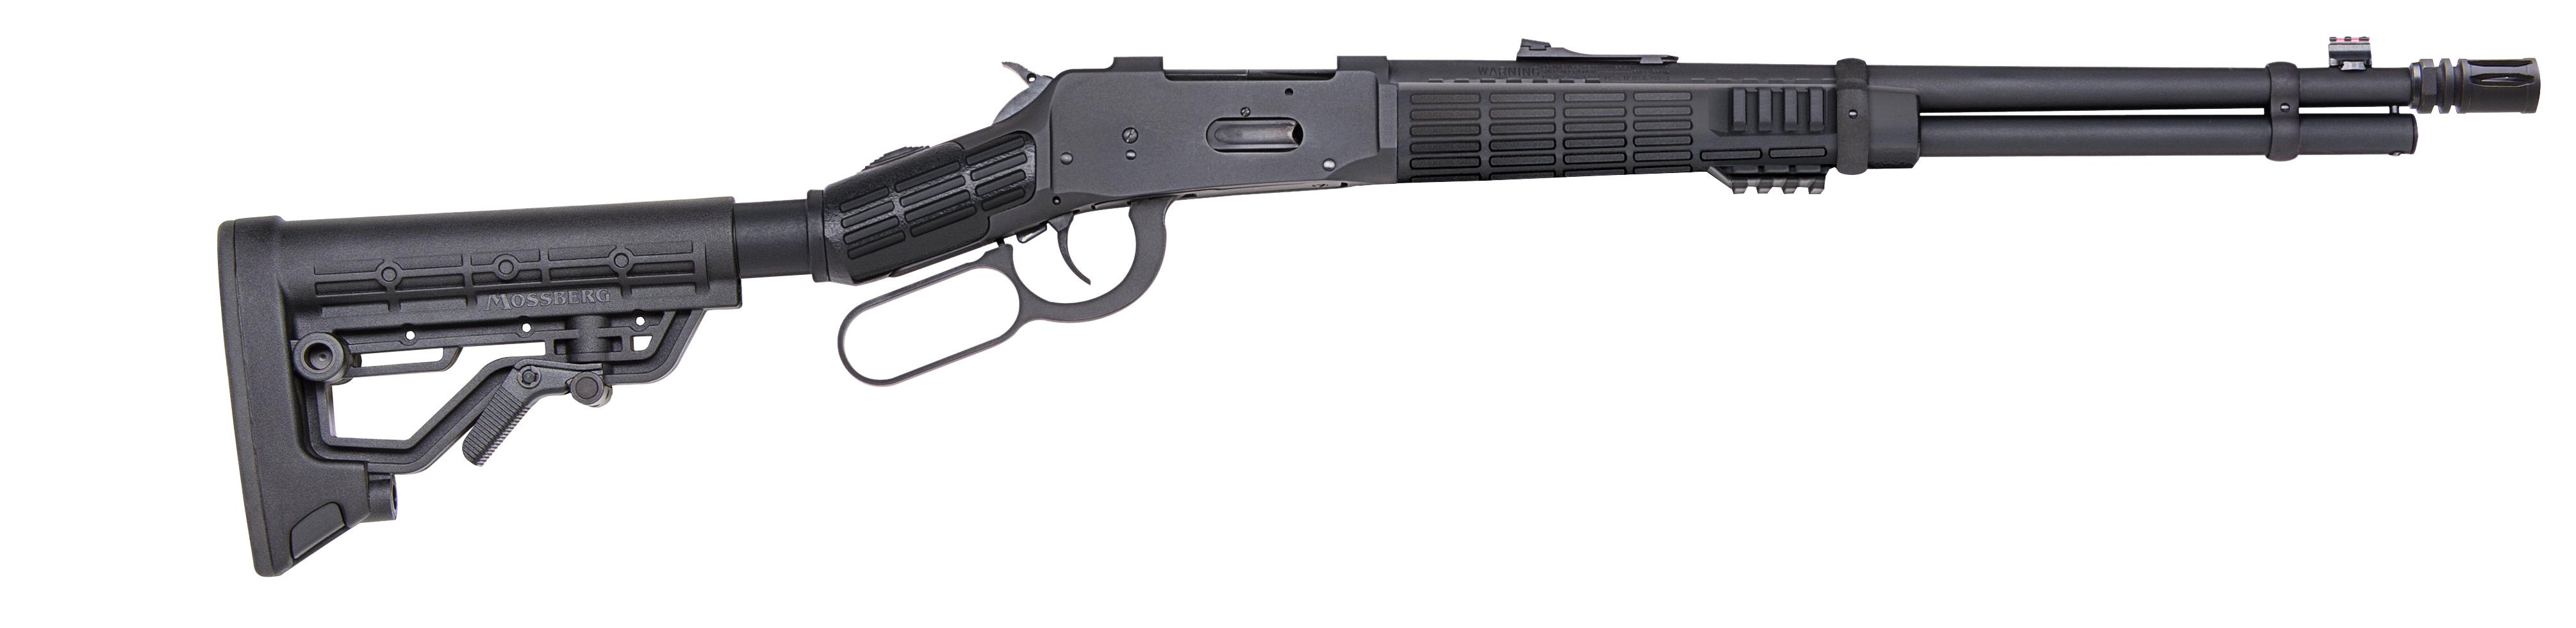 MOSSBERG 464 SPX TACTICAL